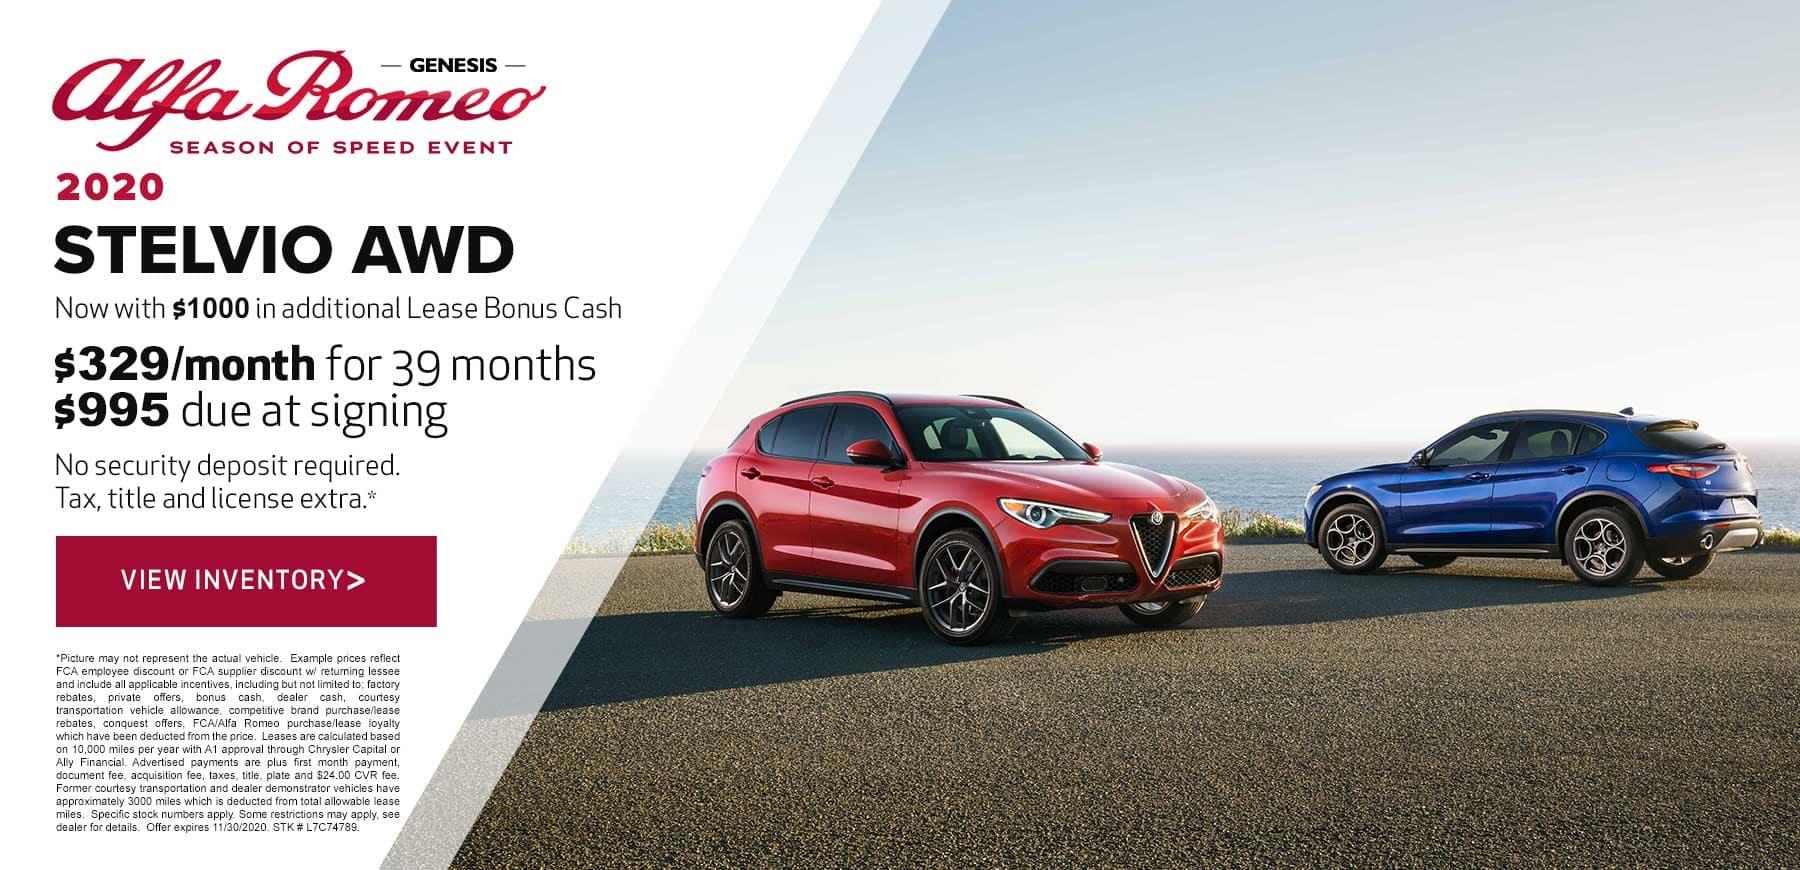 Genesis Alfa Romeo November Stelvio Lease